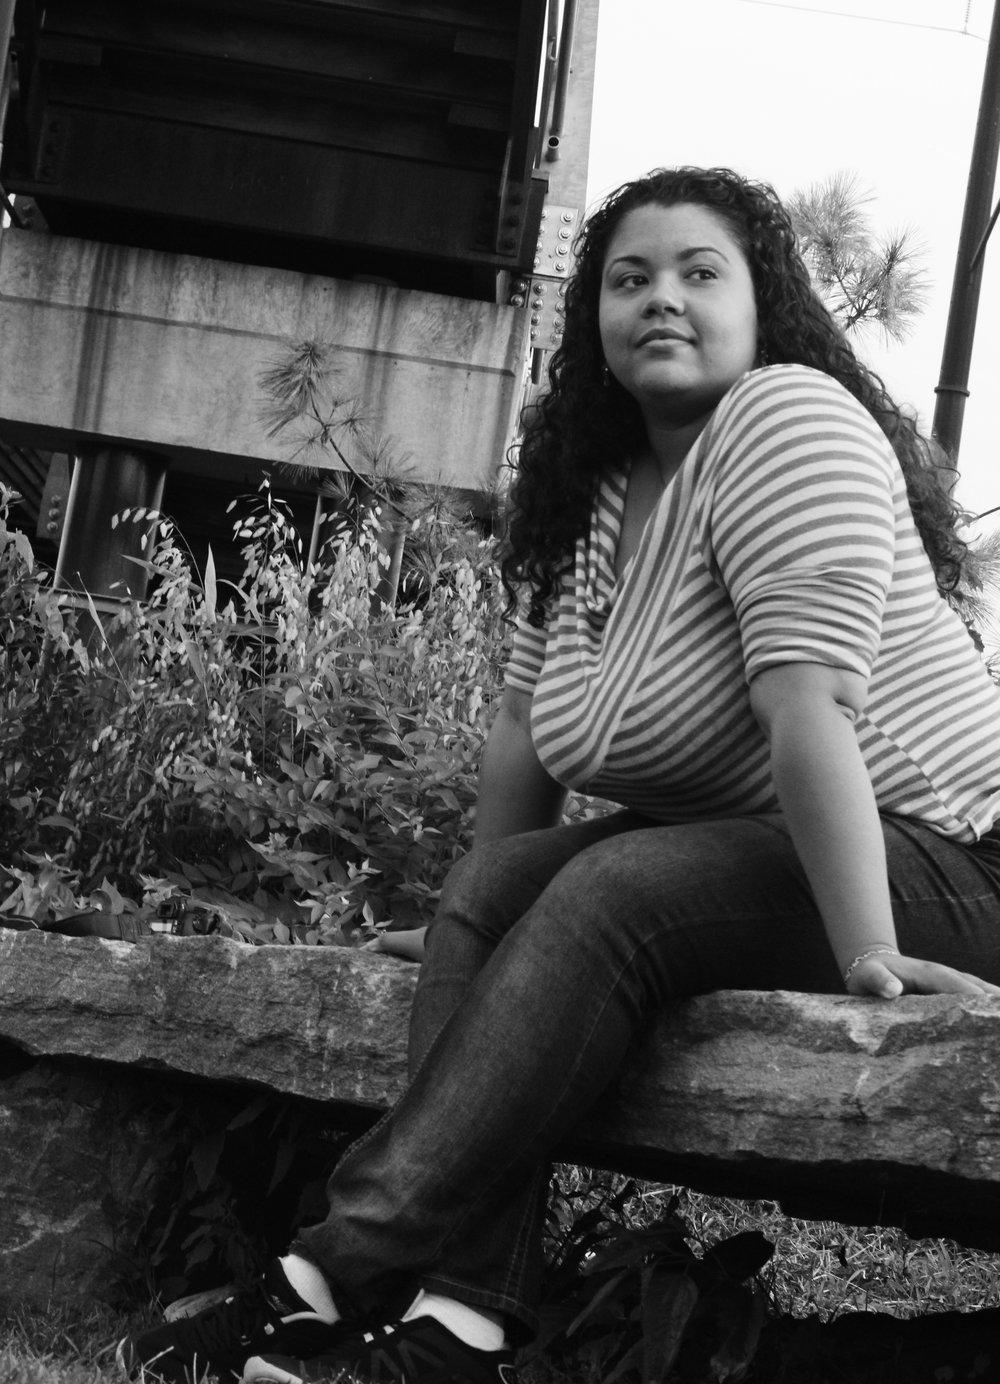 Foto tomada por Ana G Hernandez